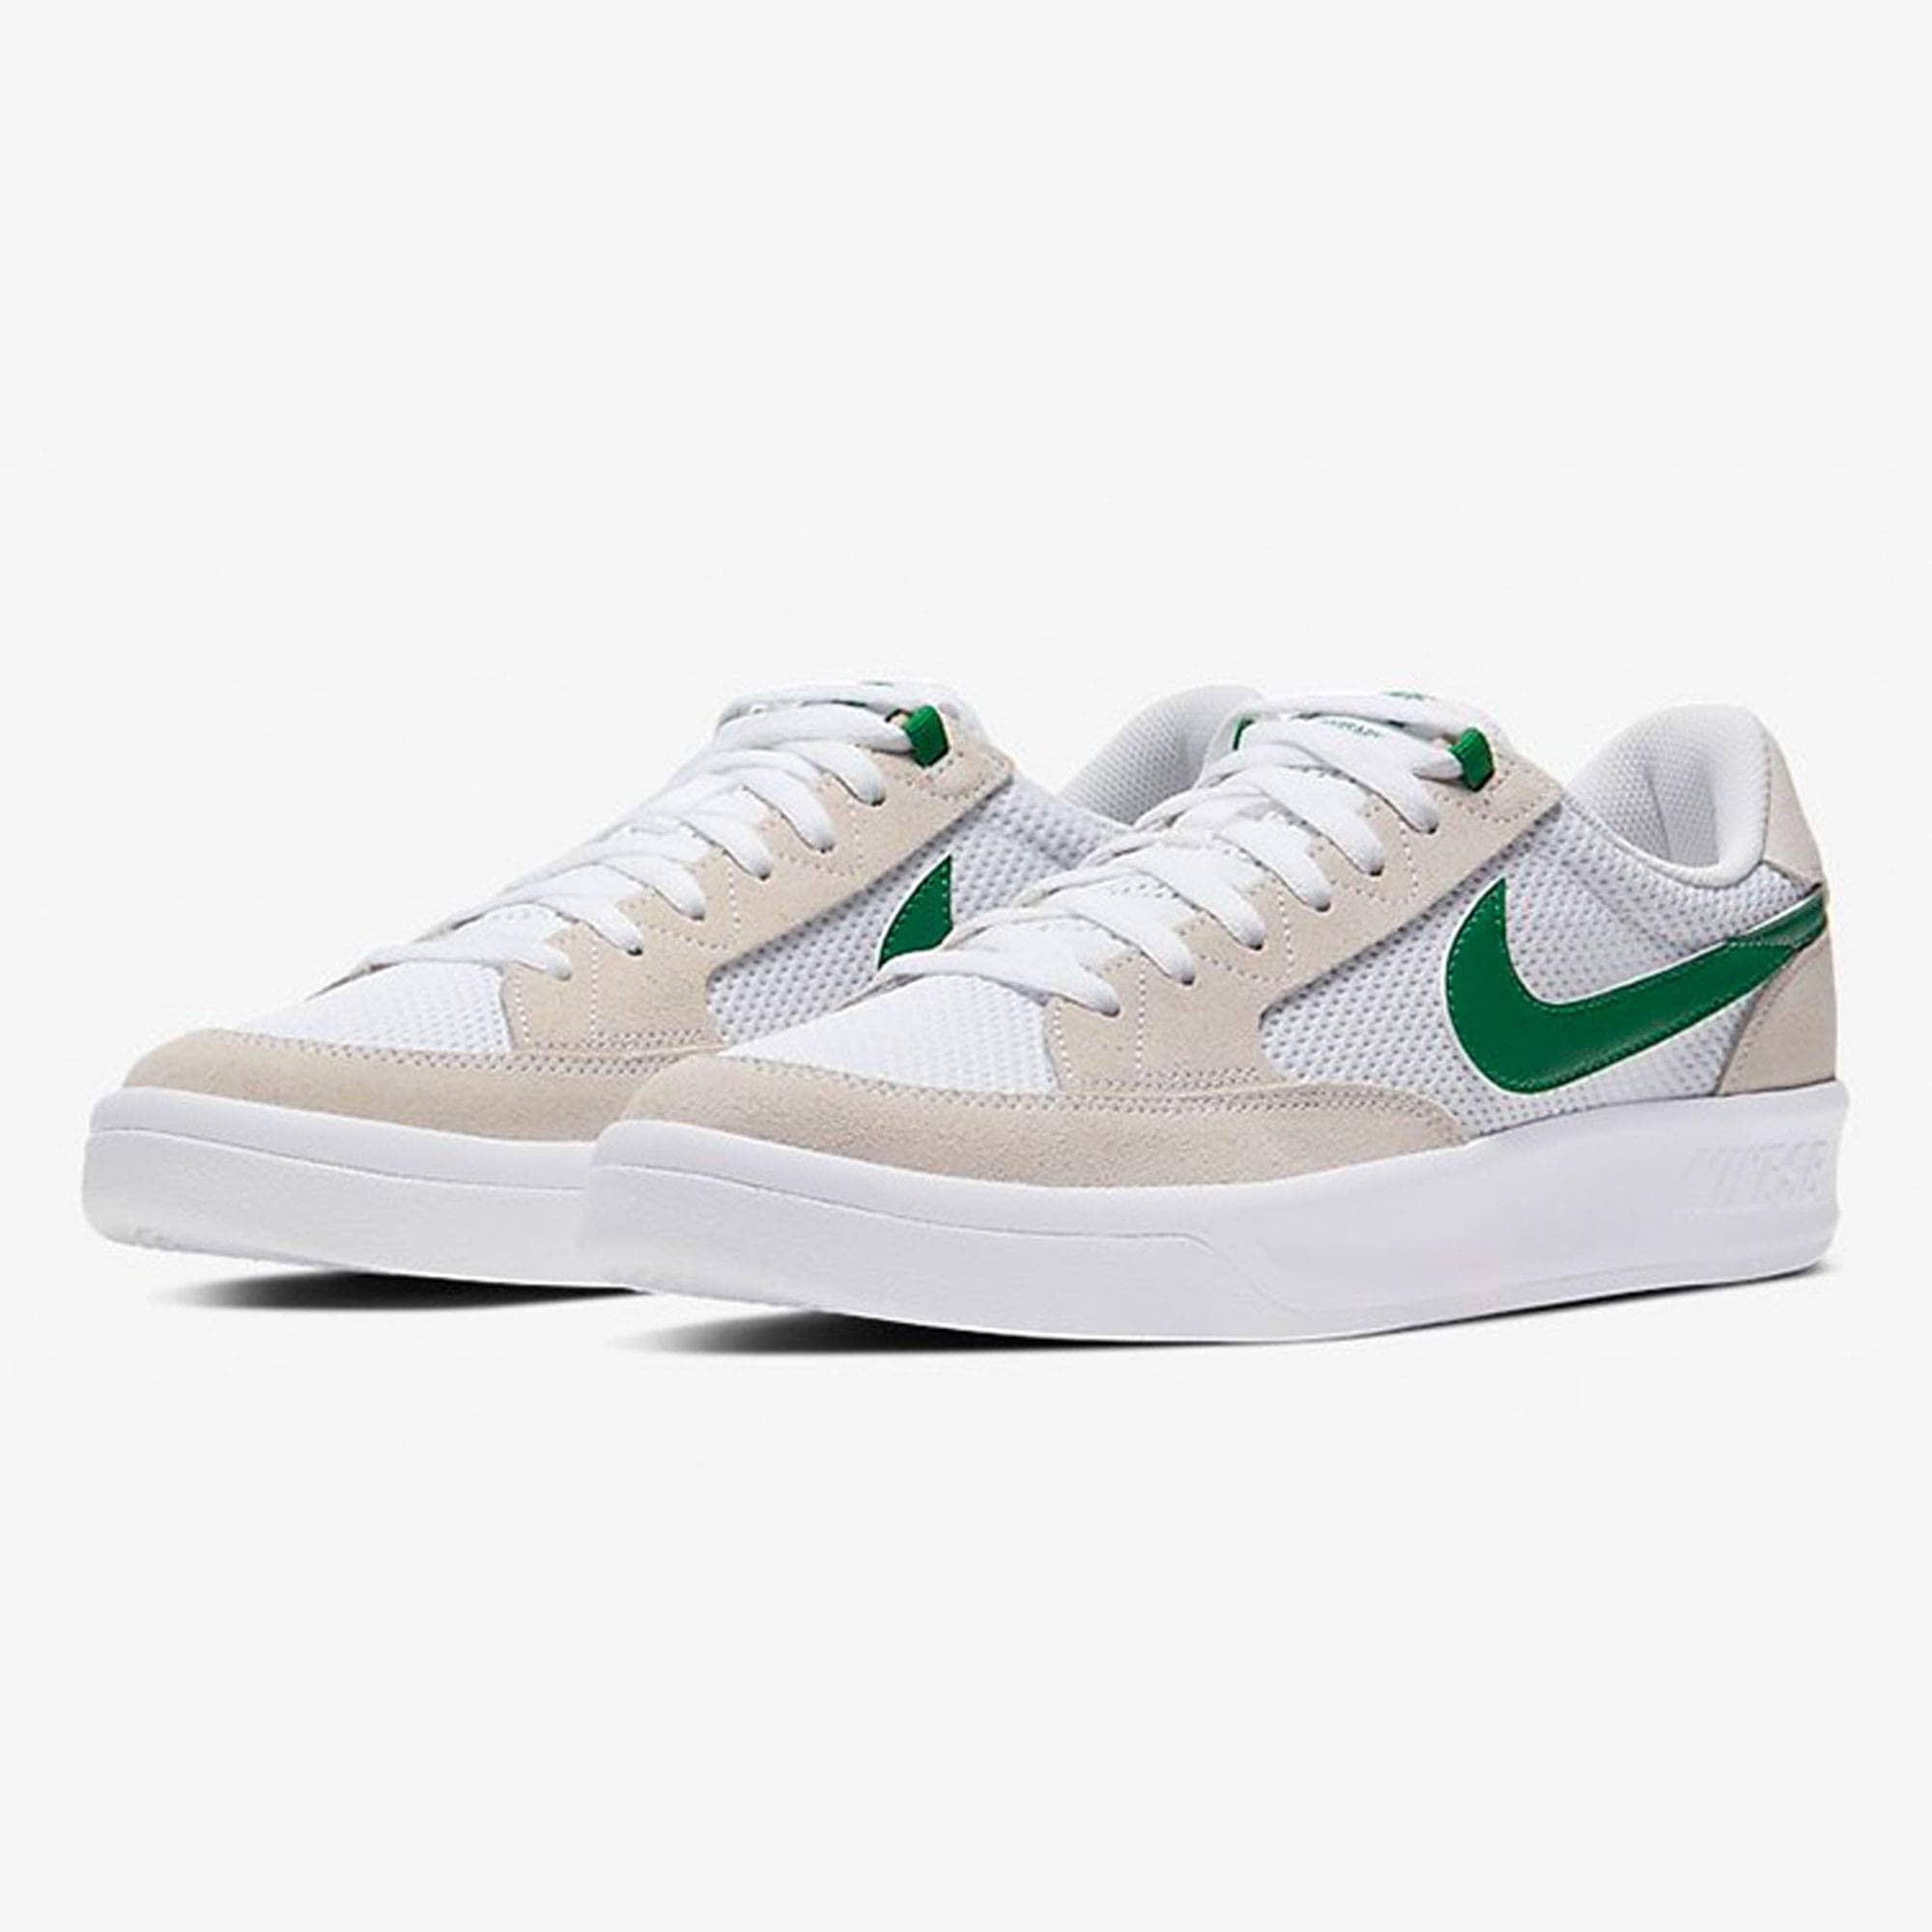 Nike SB Adversary Skate Shoes - White/Pine Green-White-White